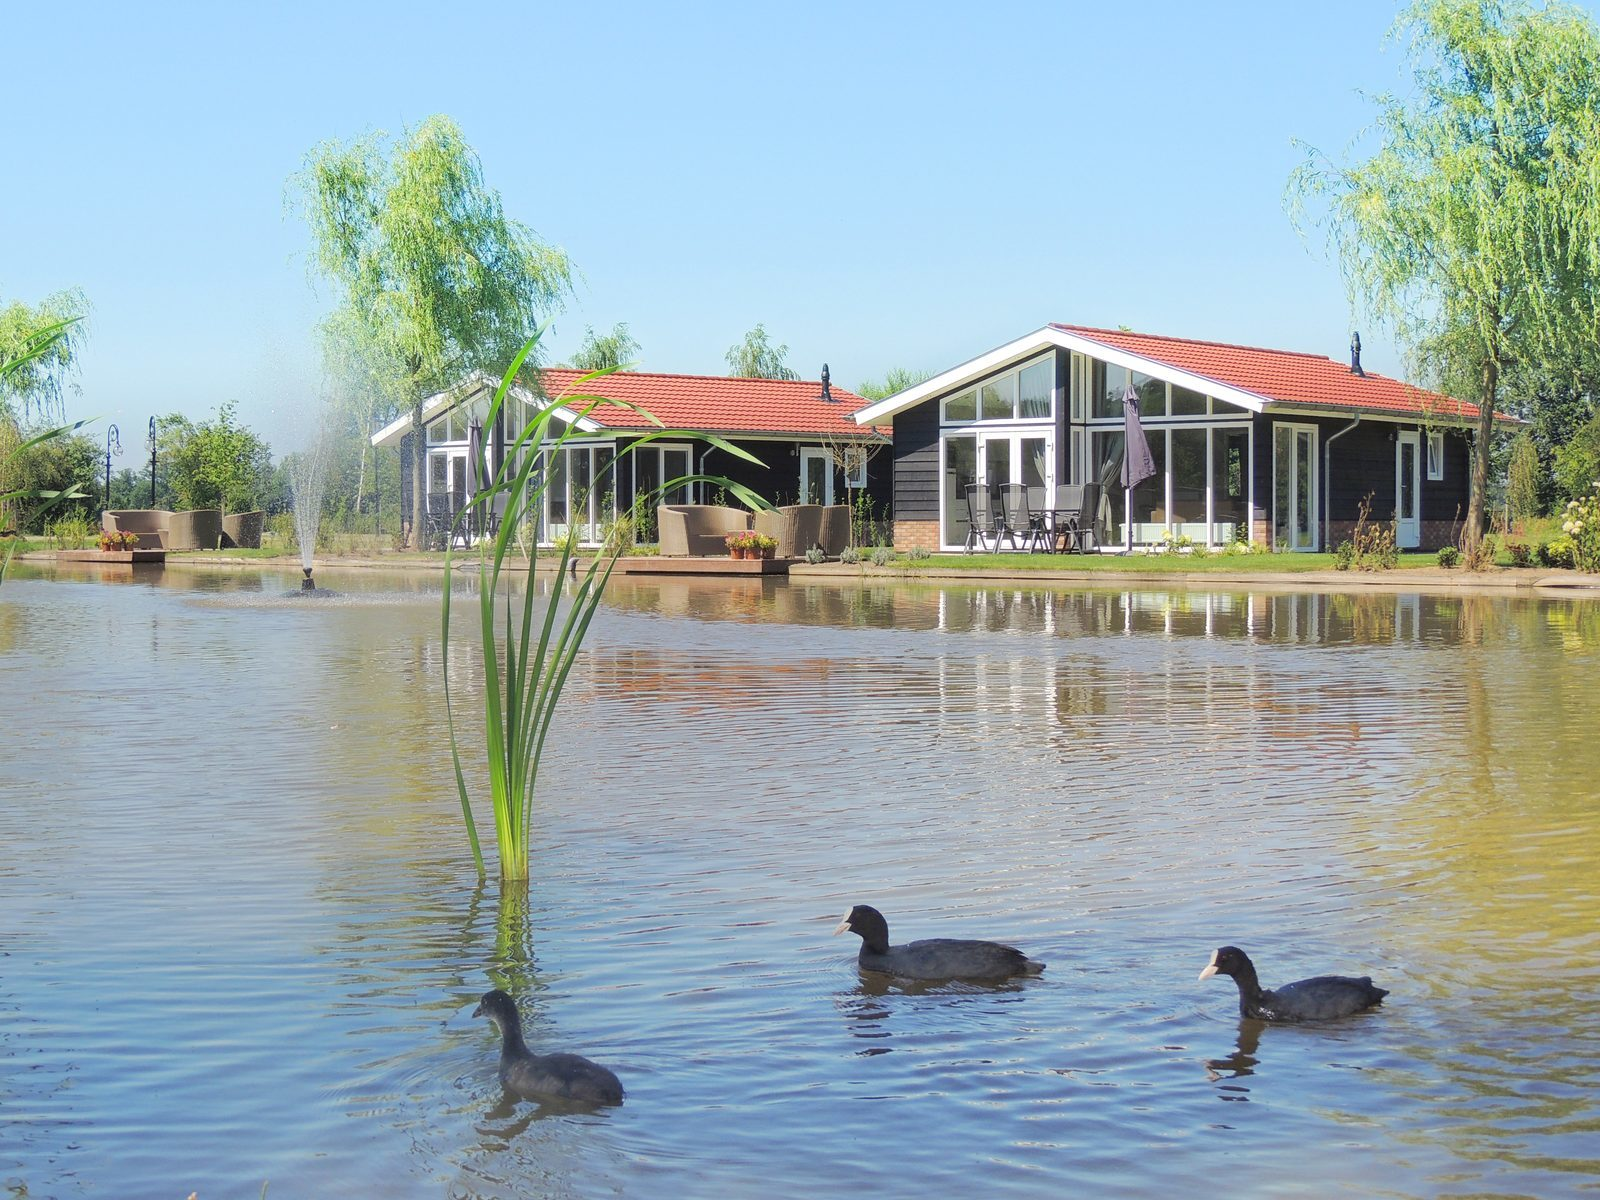 25 to 27 May: Open house days in Gelderland (Lichtenvoorde)